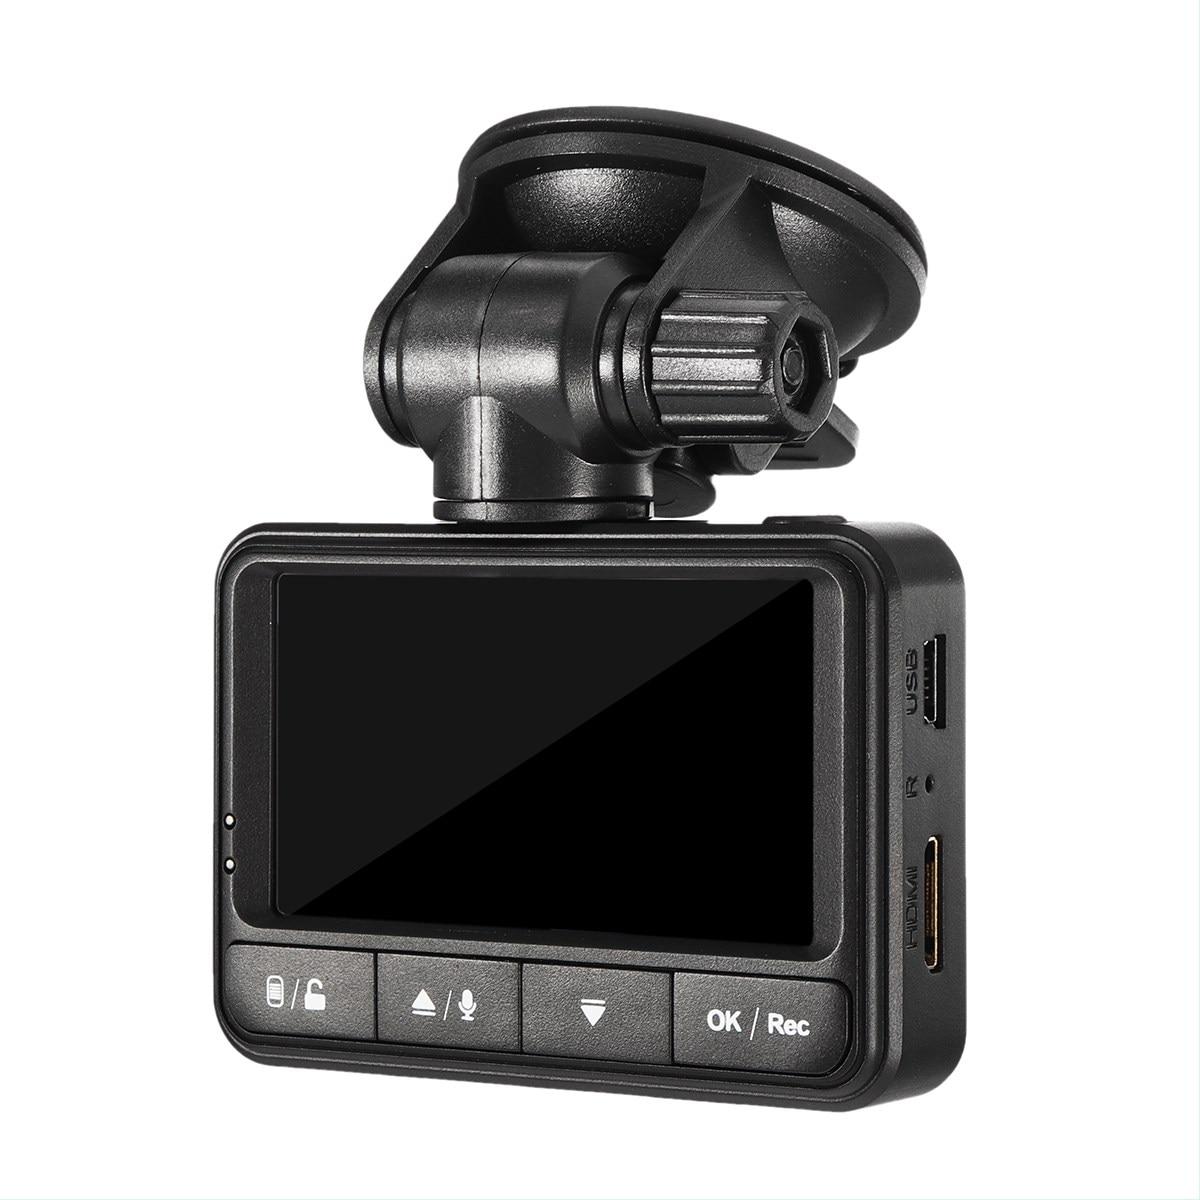 2 45inch Car DVR font b Camera b font Video Recorder Night Vision GPS Dash Cam